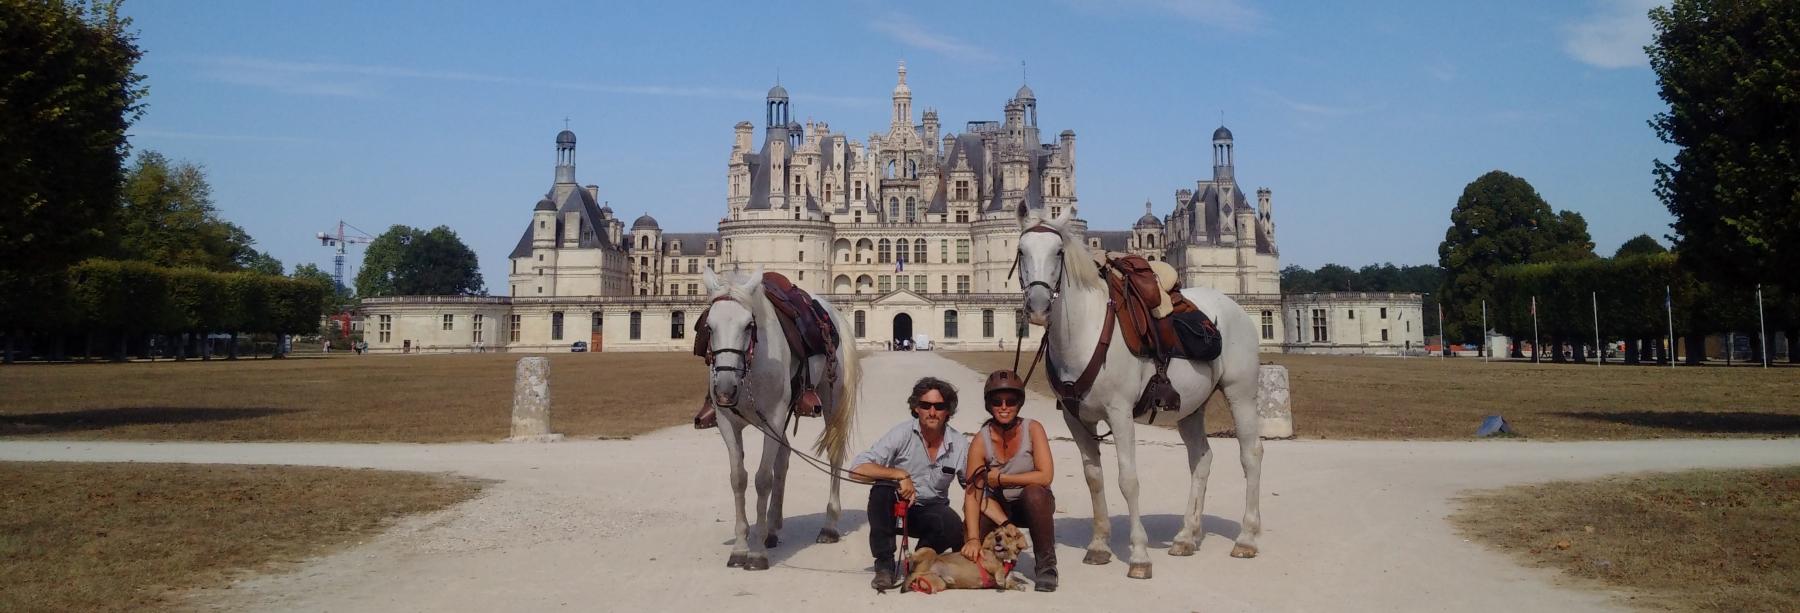 Discover France on horseback riding